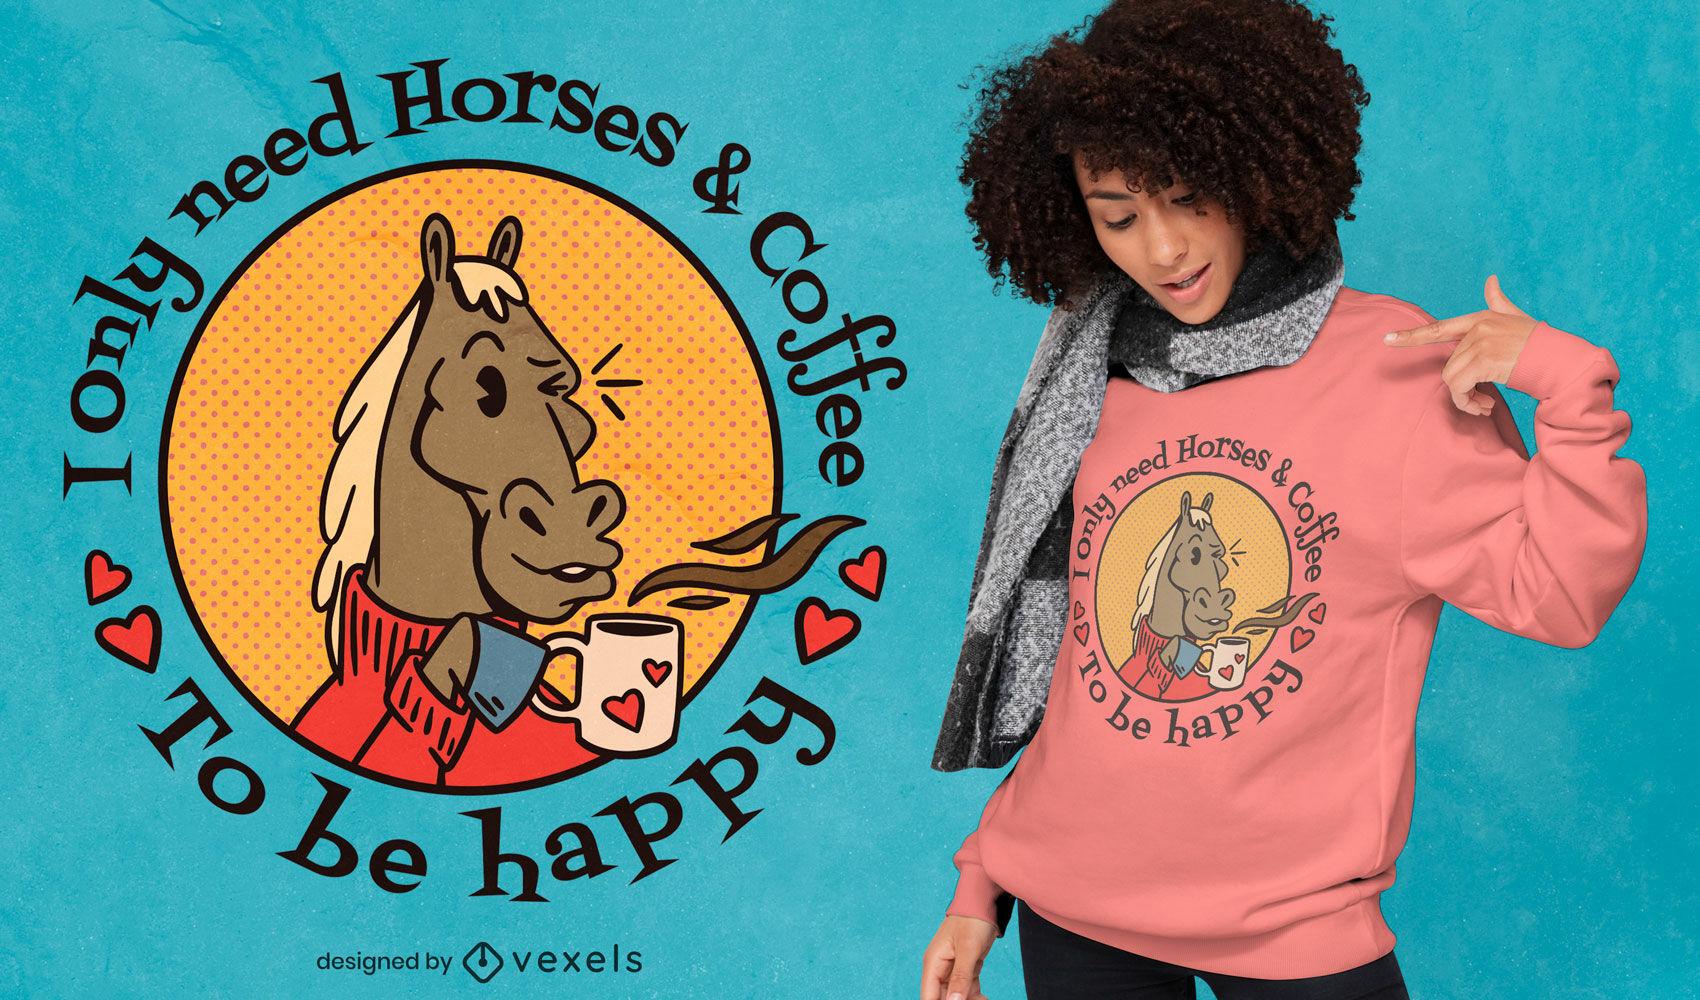 Dise?o de camiseta de amor de caballos y caf?.